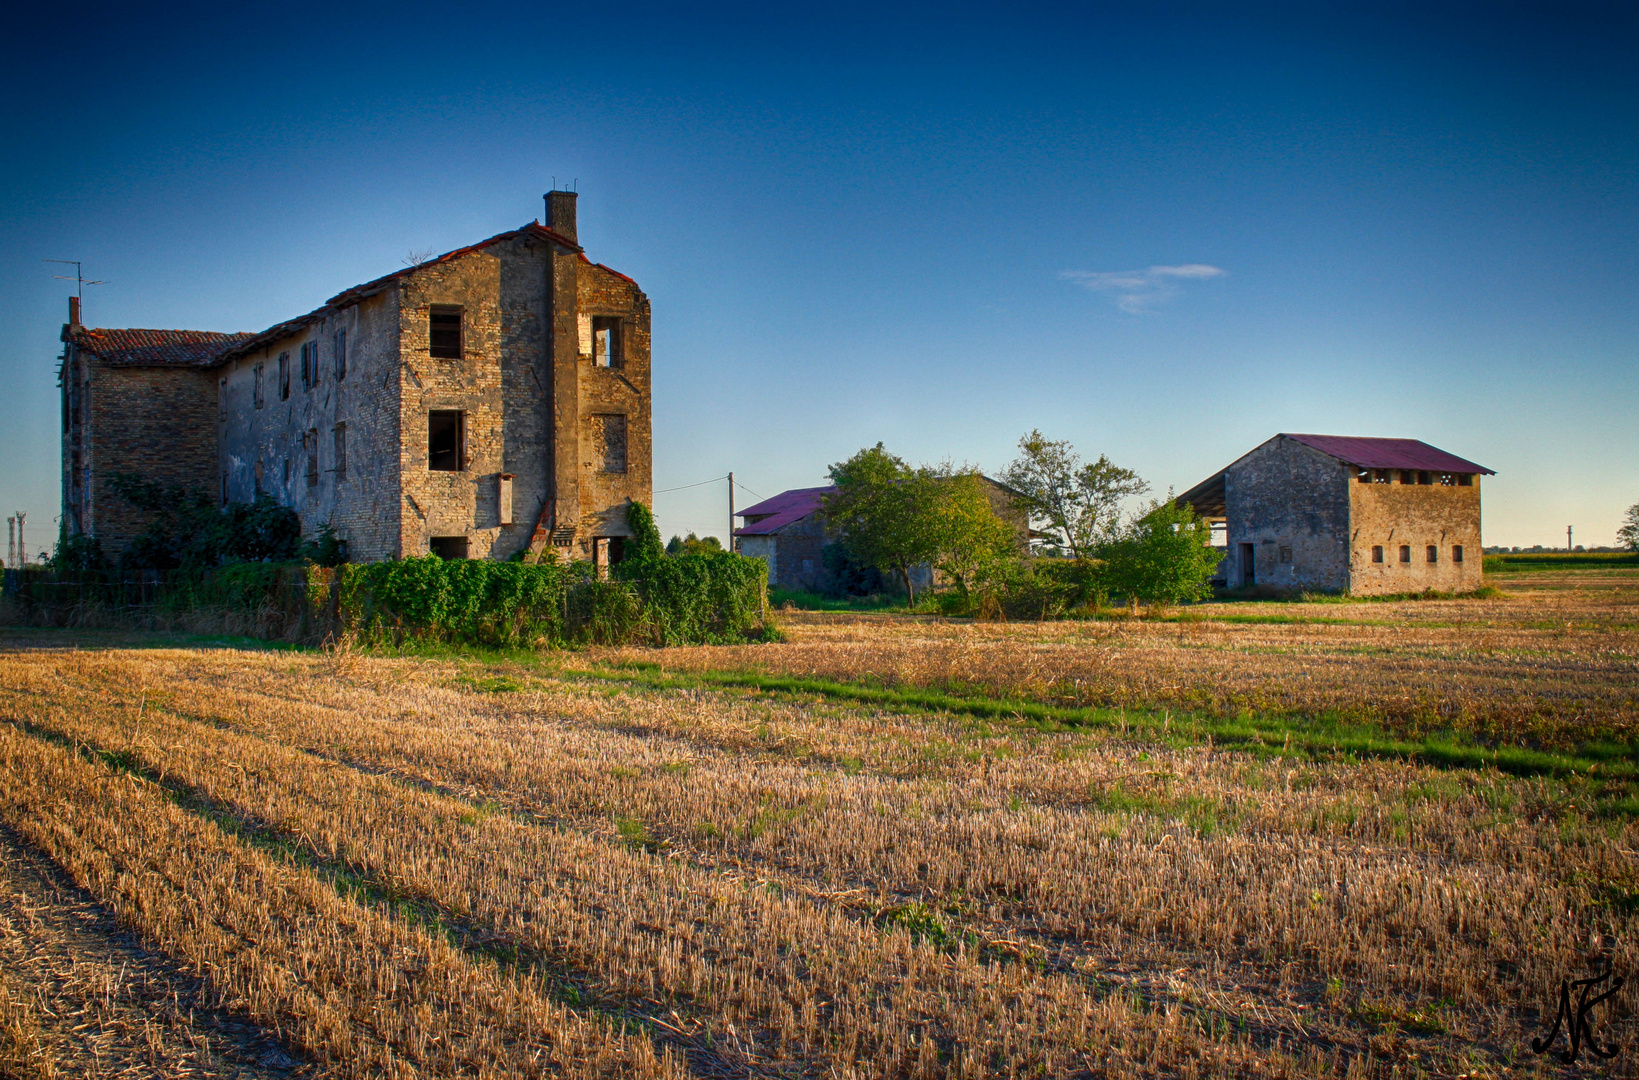 Fabrik Ruine